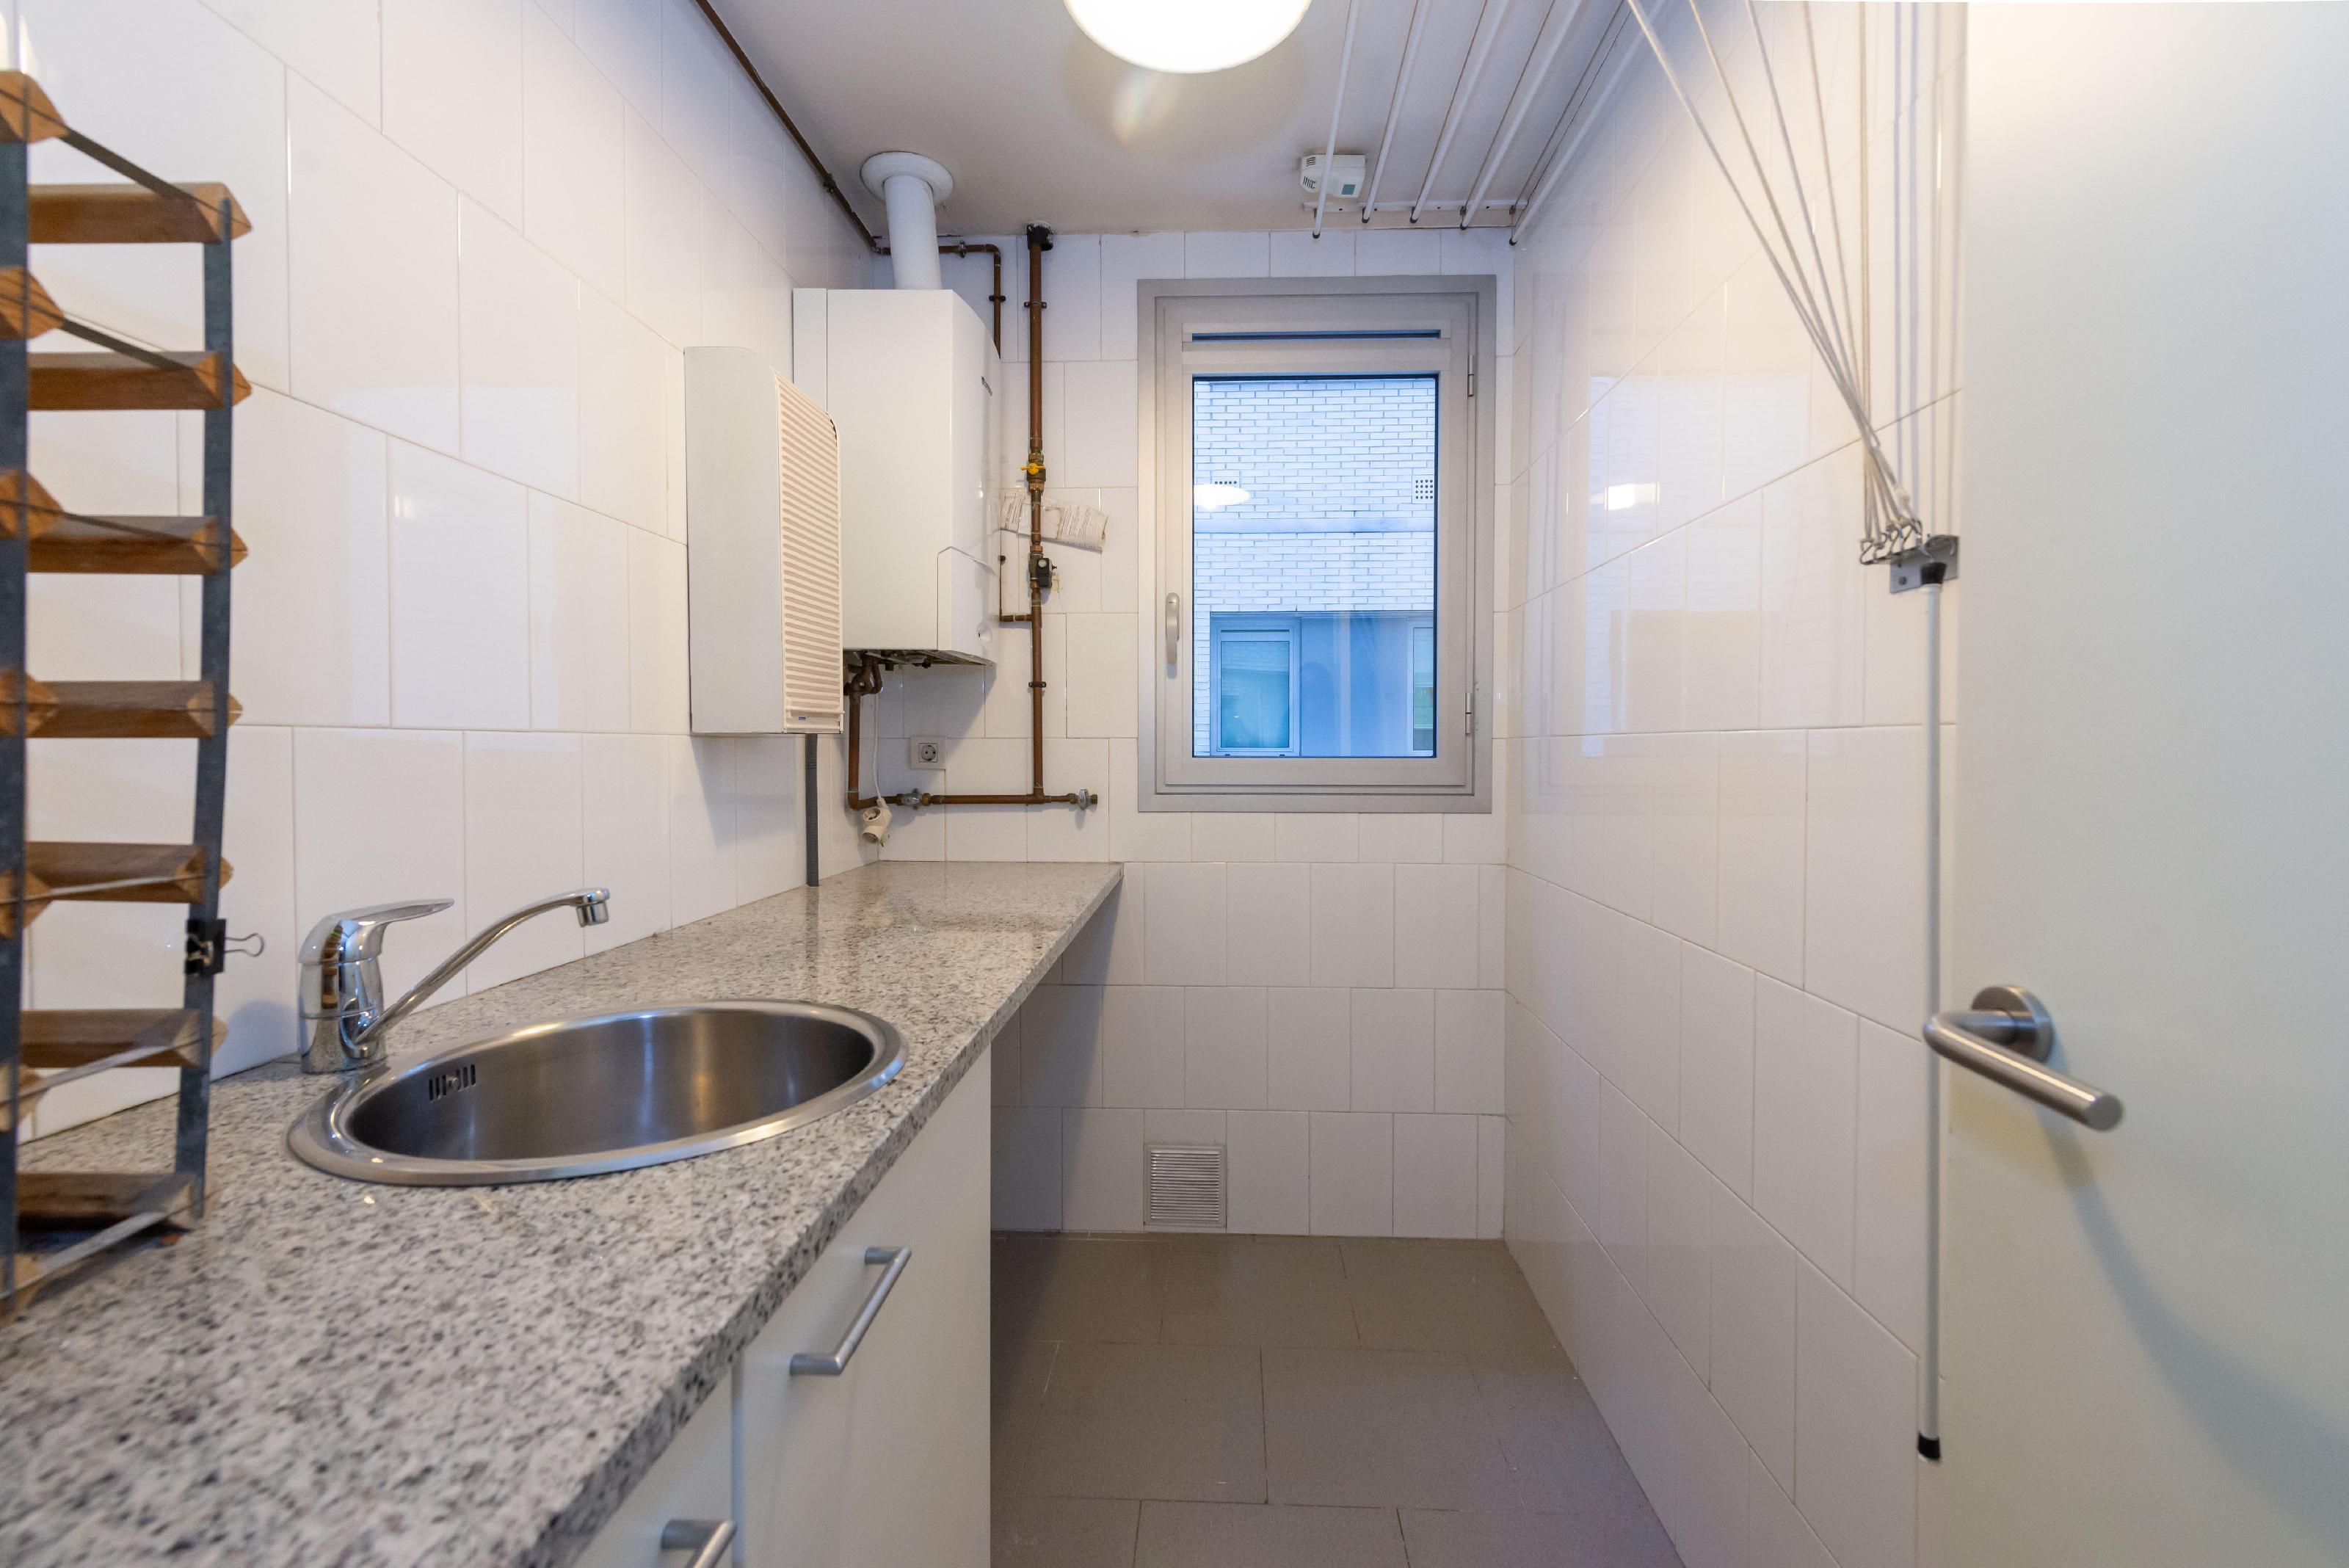 251446 Flat for sale in Sarrià-Sant Gervasi, Tres Torres 19